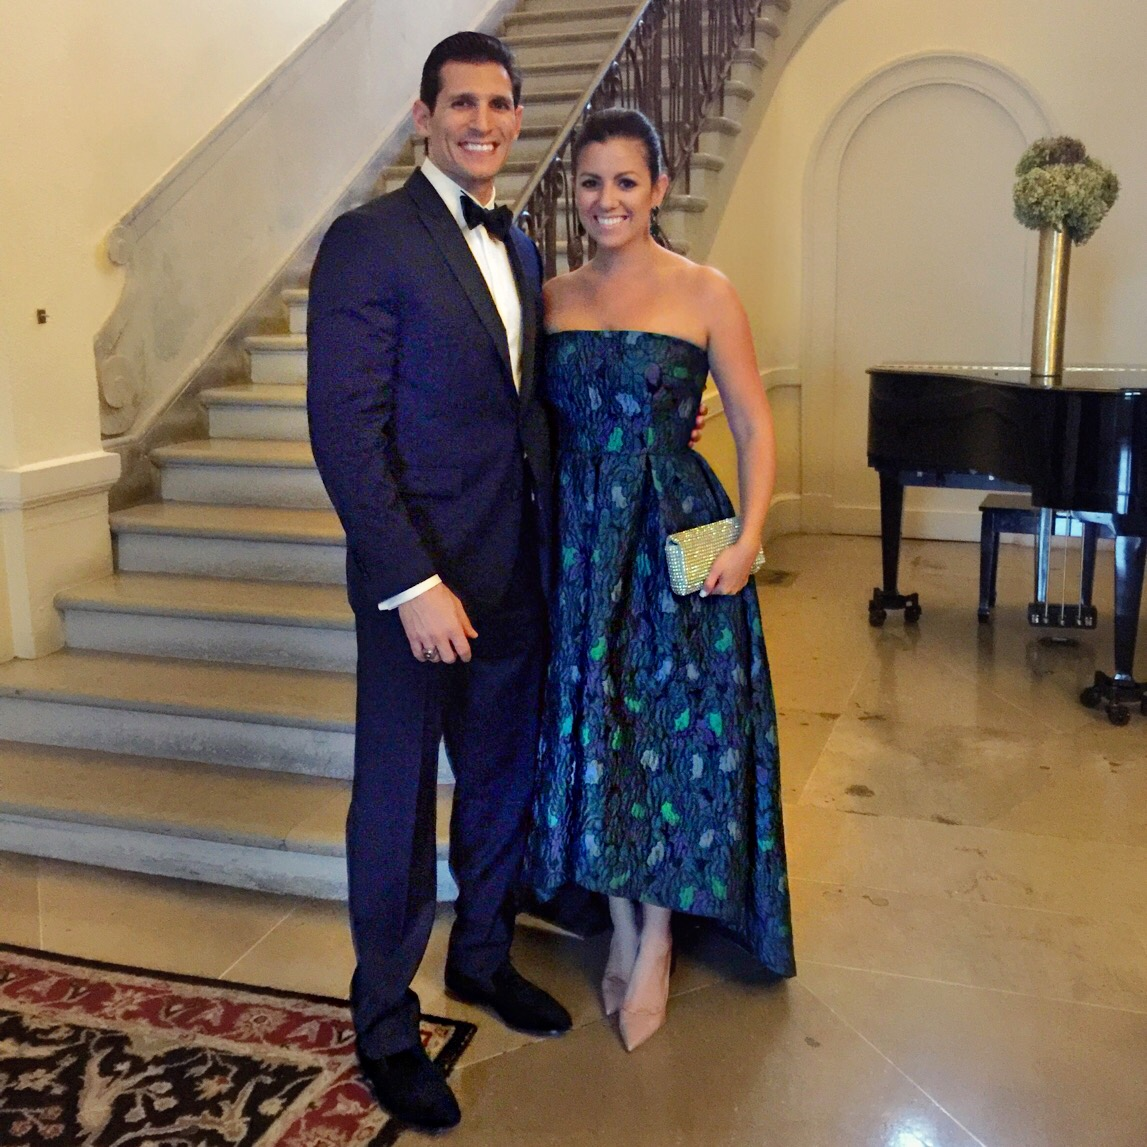 Casey Cittadino, Jaime Cittadino, Oheka Castle wedding